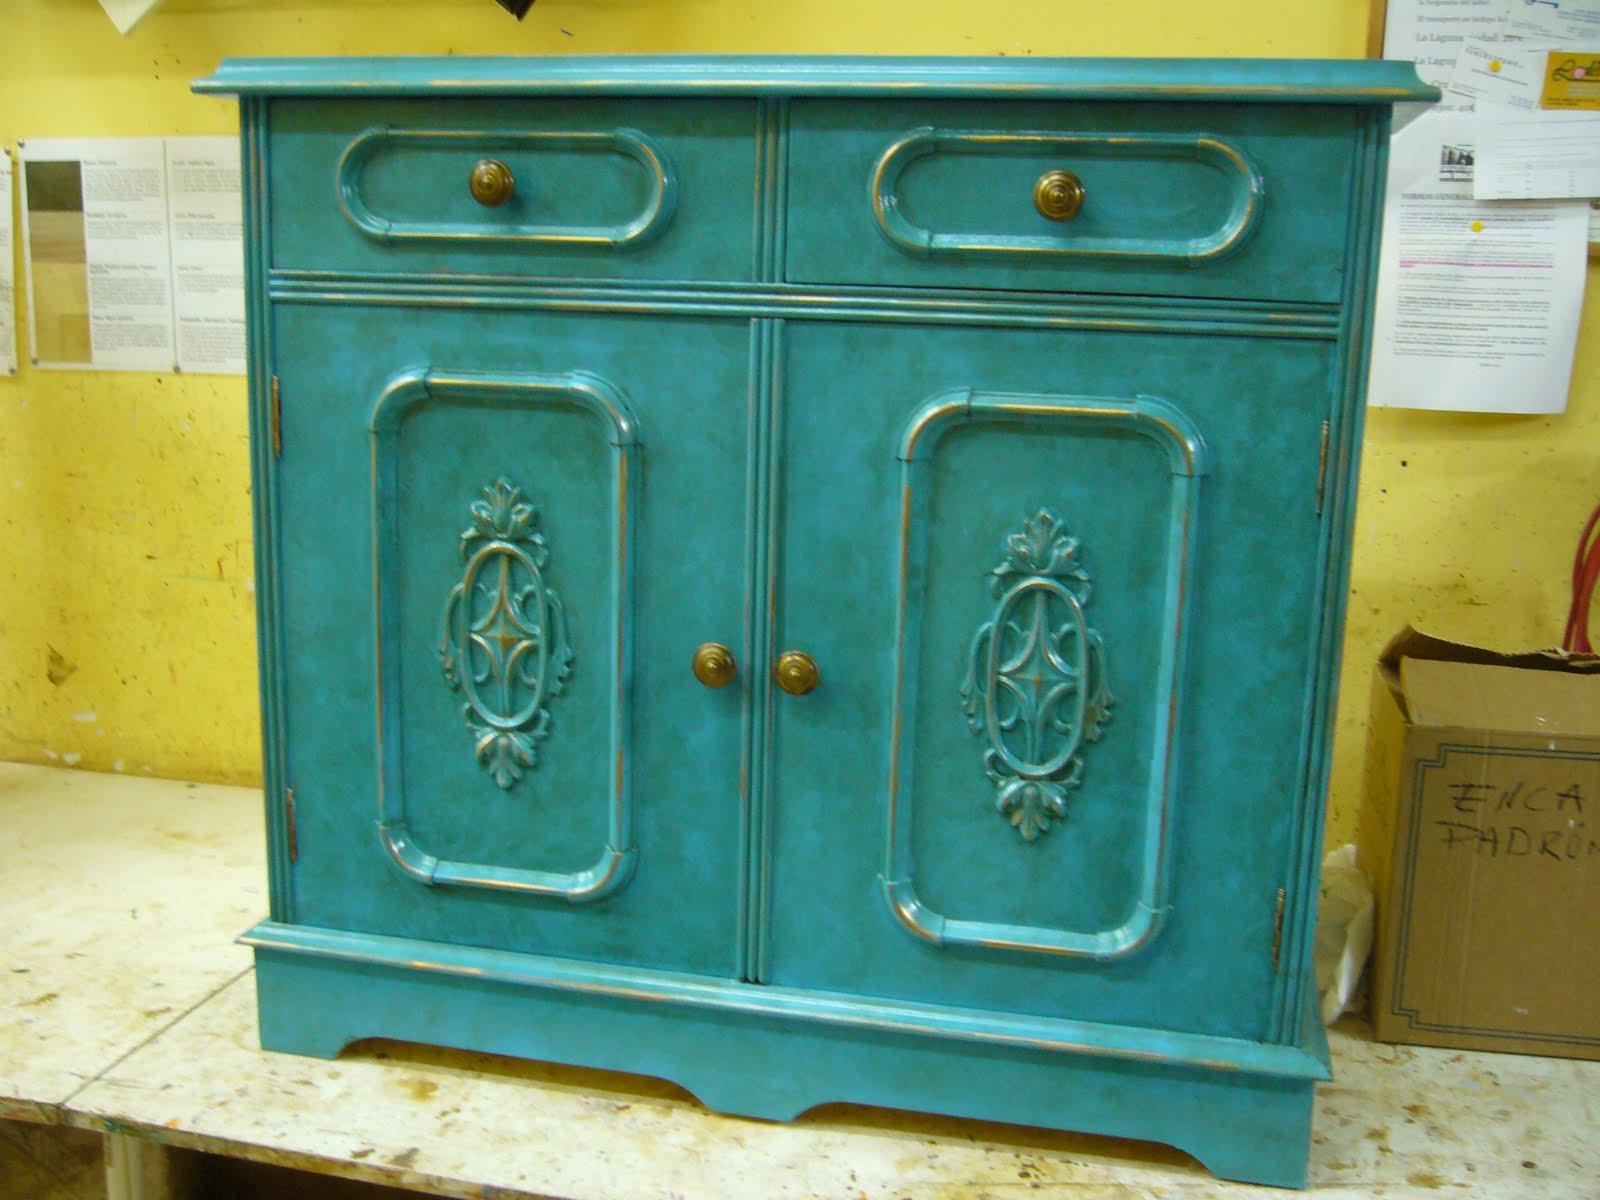 La restauradora muebles patinados dos azules for Mueble castellano restaurado